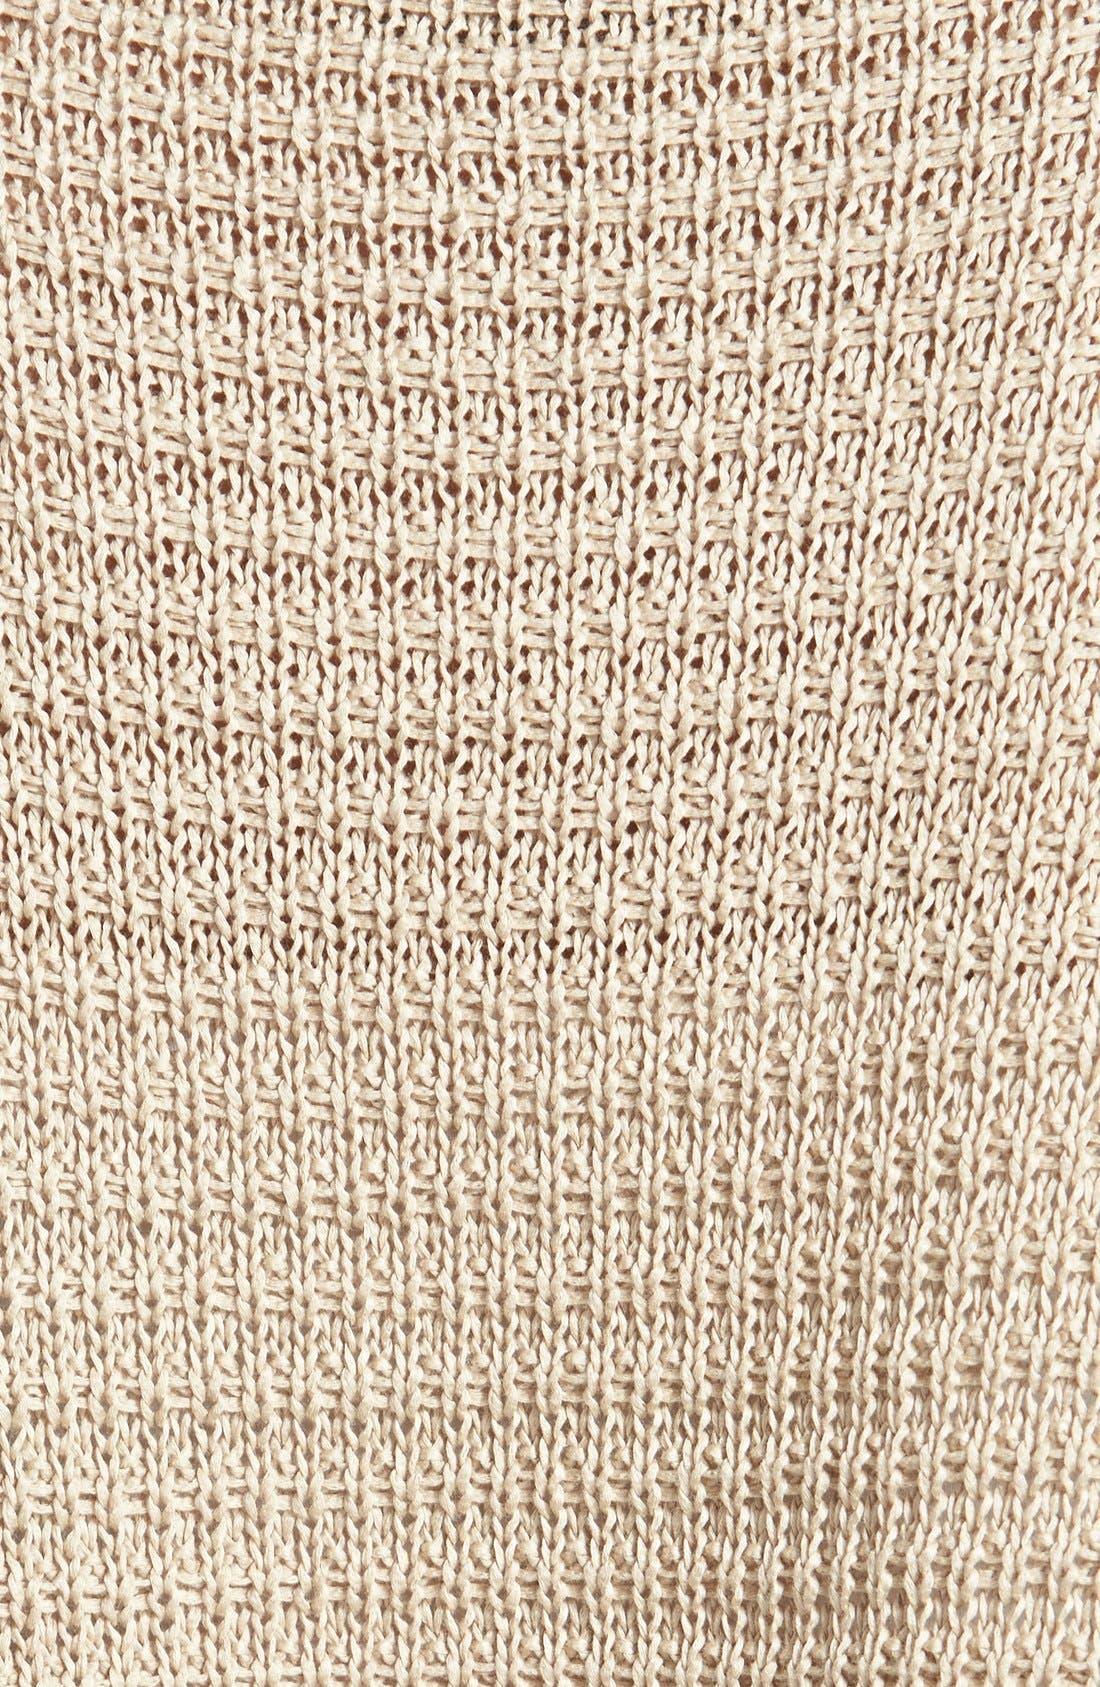 Alternate Image 3  - Weekend Max Mara 'Sapone' Crop Cotton Sweater